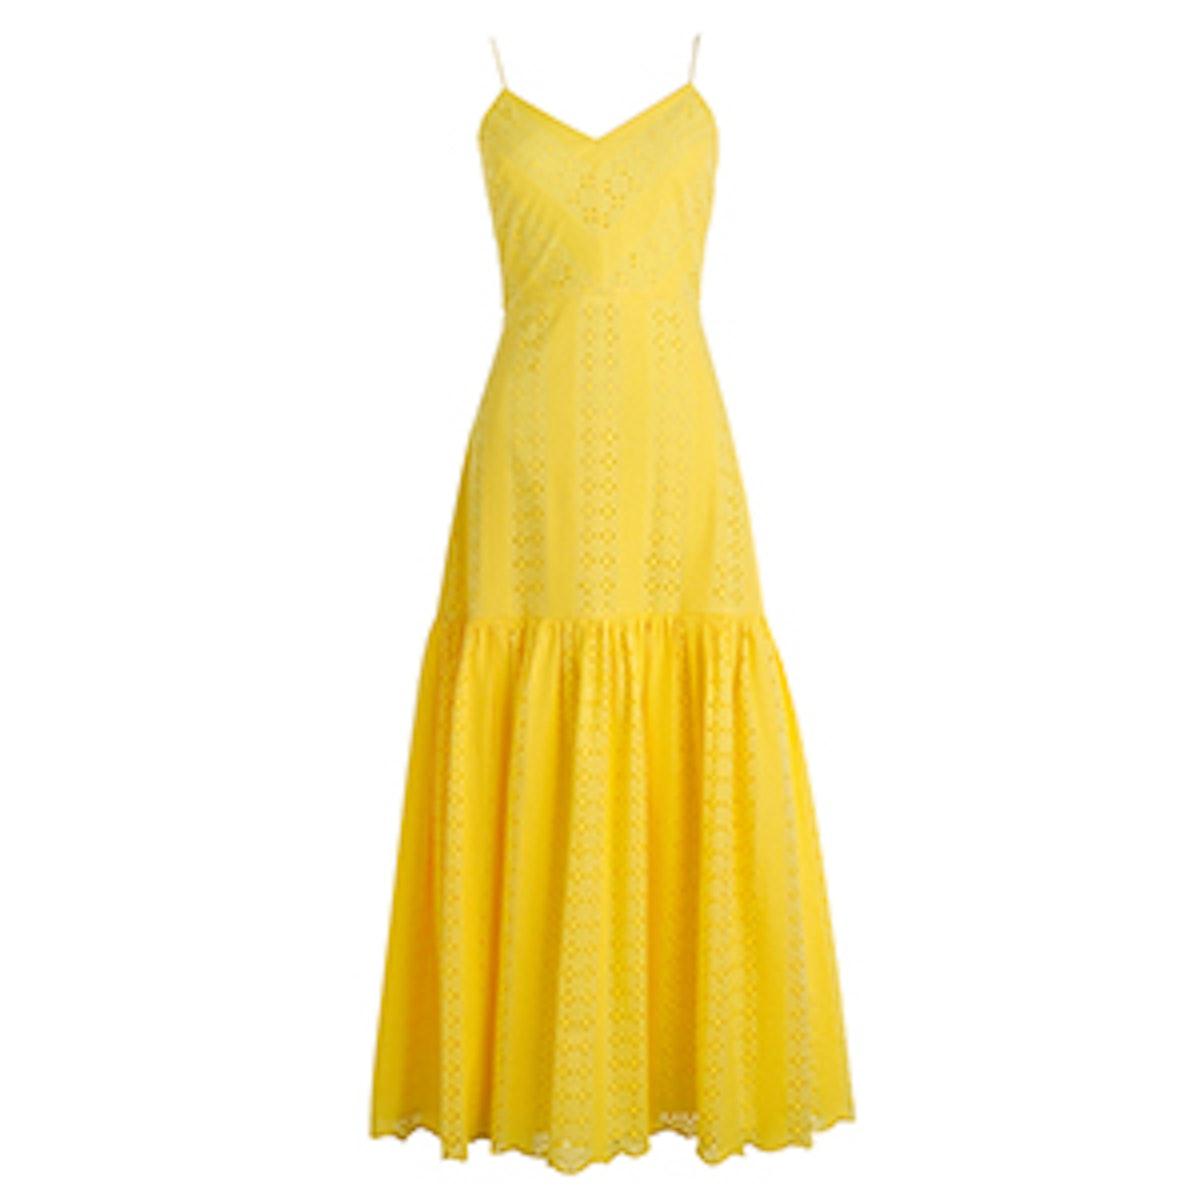 Tiered Spaghetti-Strap Midi Dress